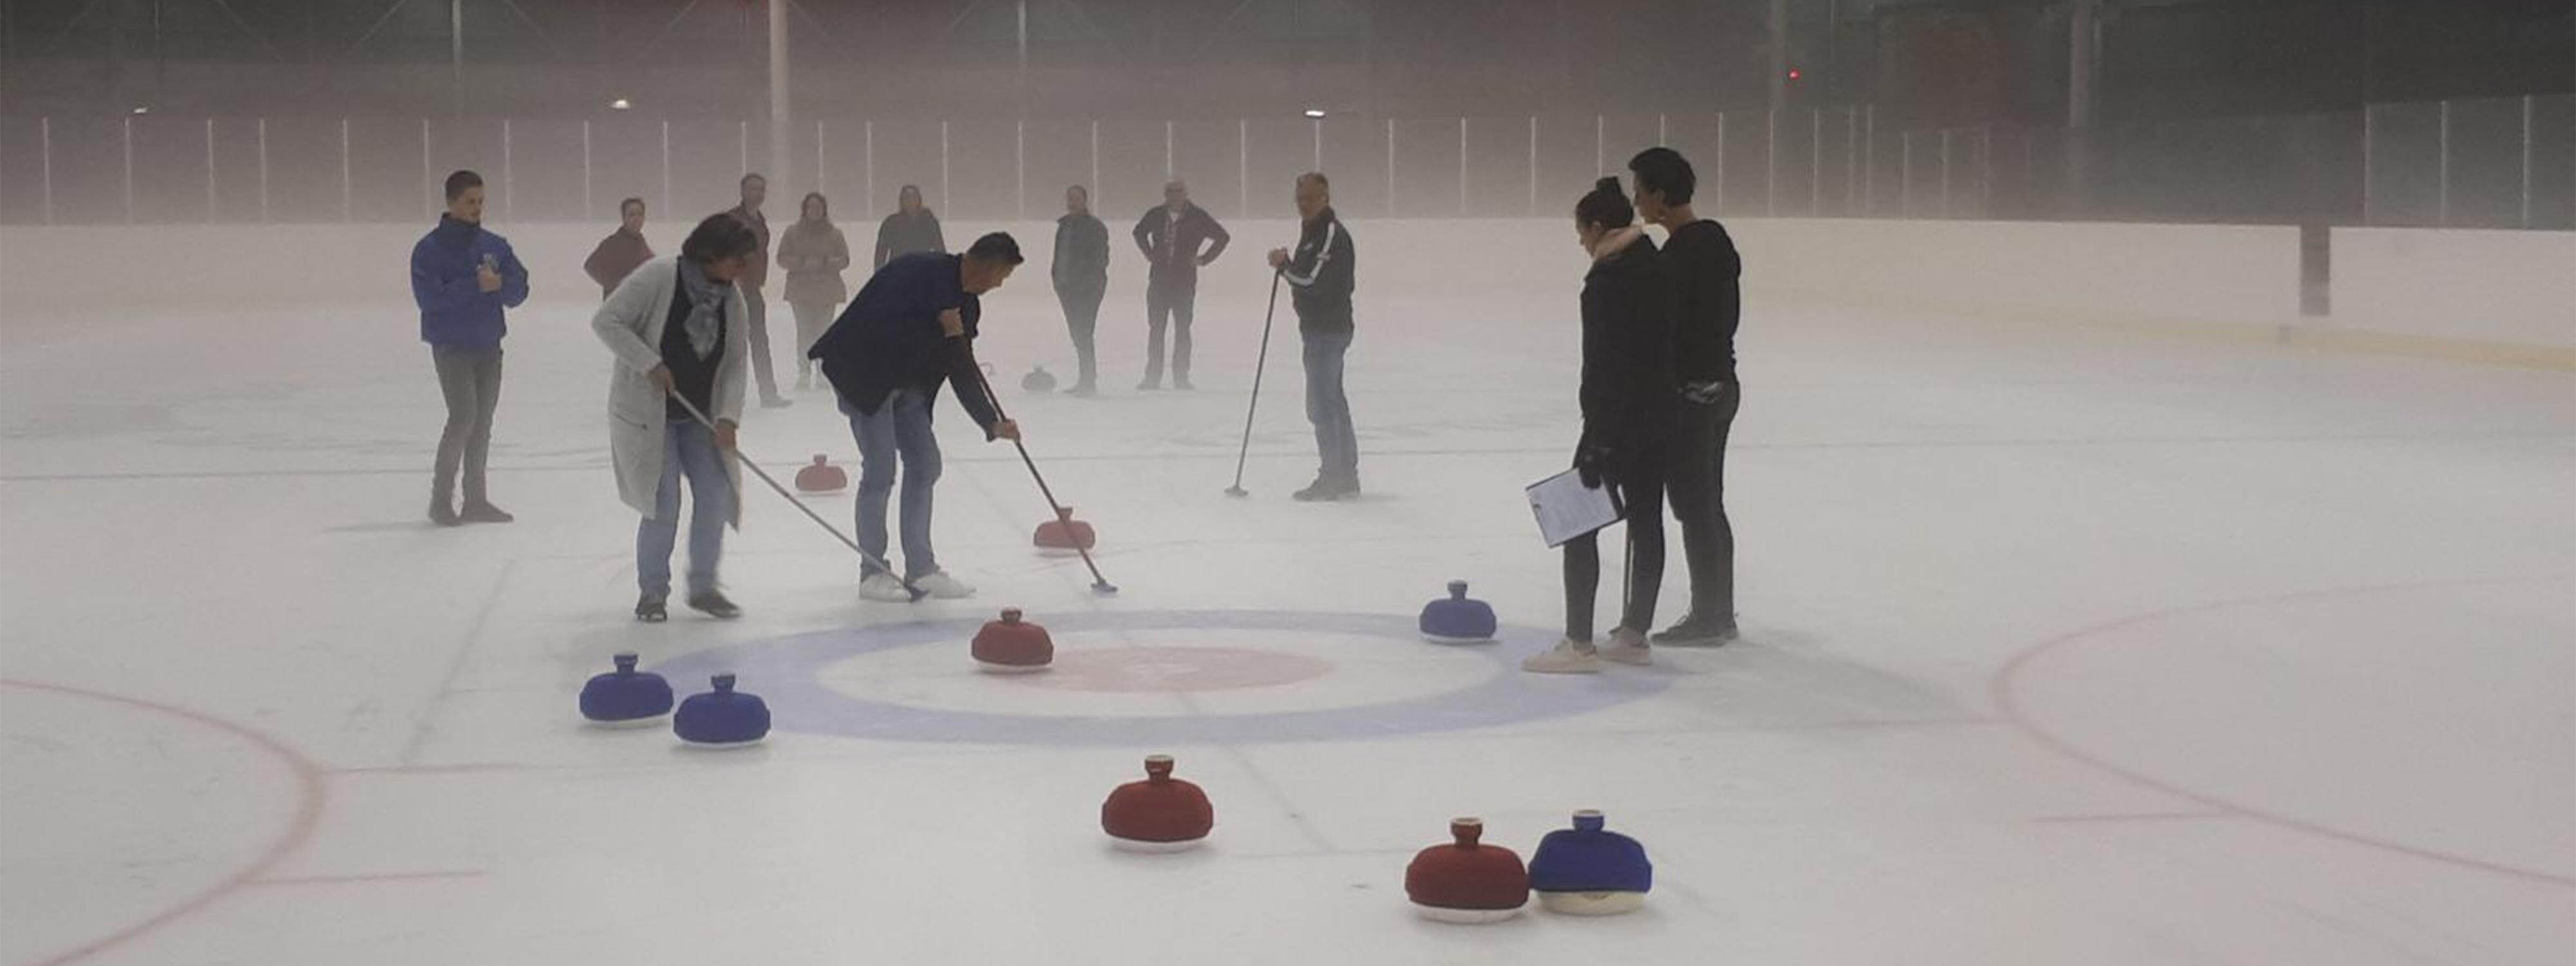 teamuitje-den-bosch-winteruitje-fun-curling